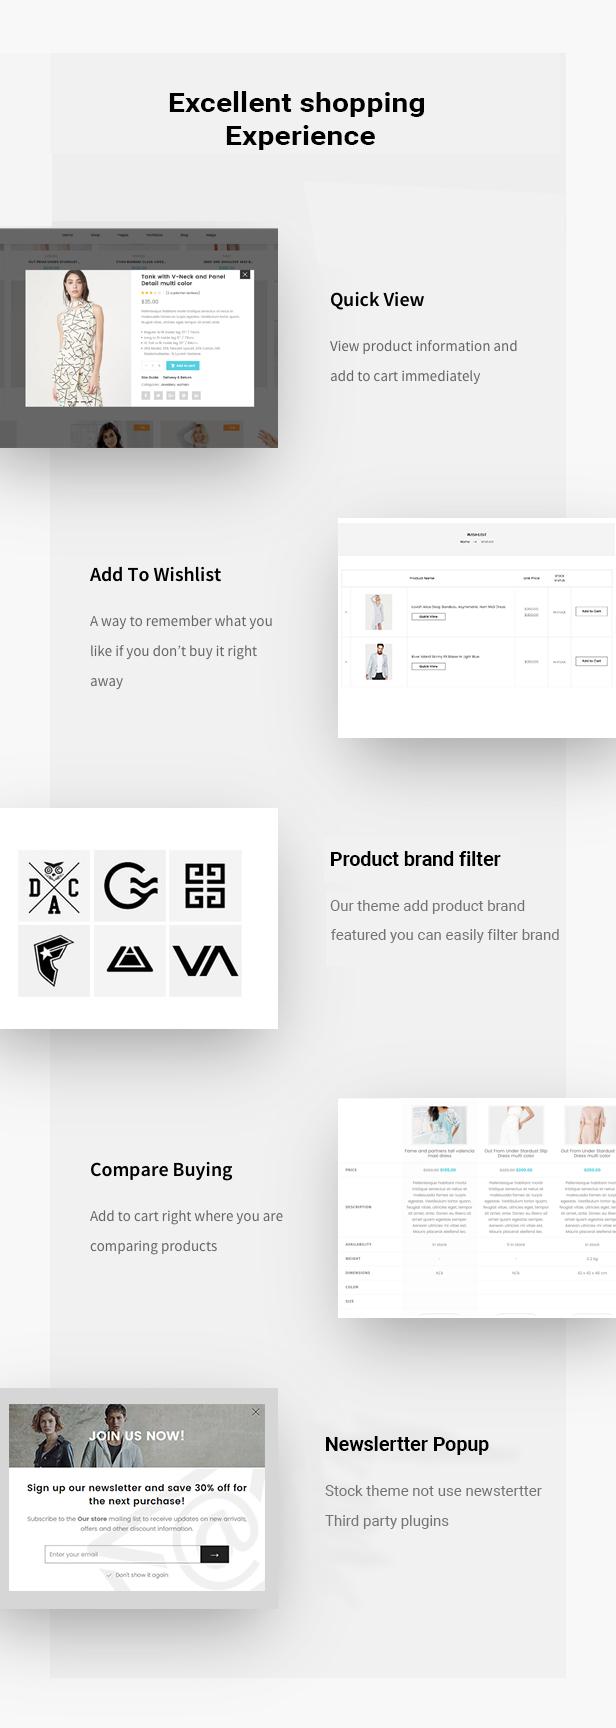 Xtocky - WooCommerce Responsive Theme - 6